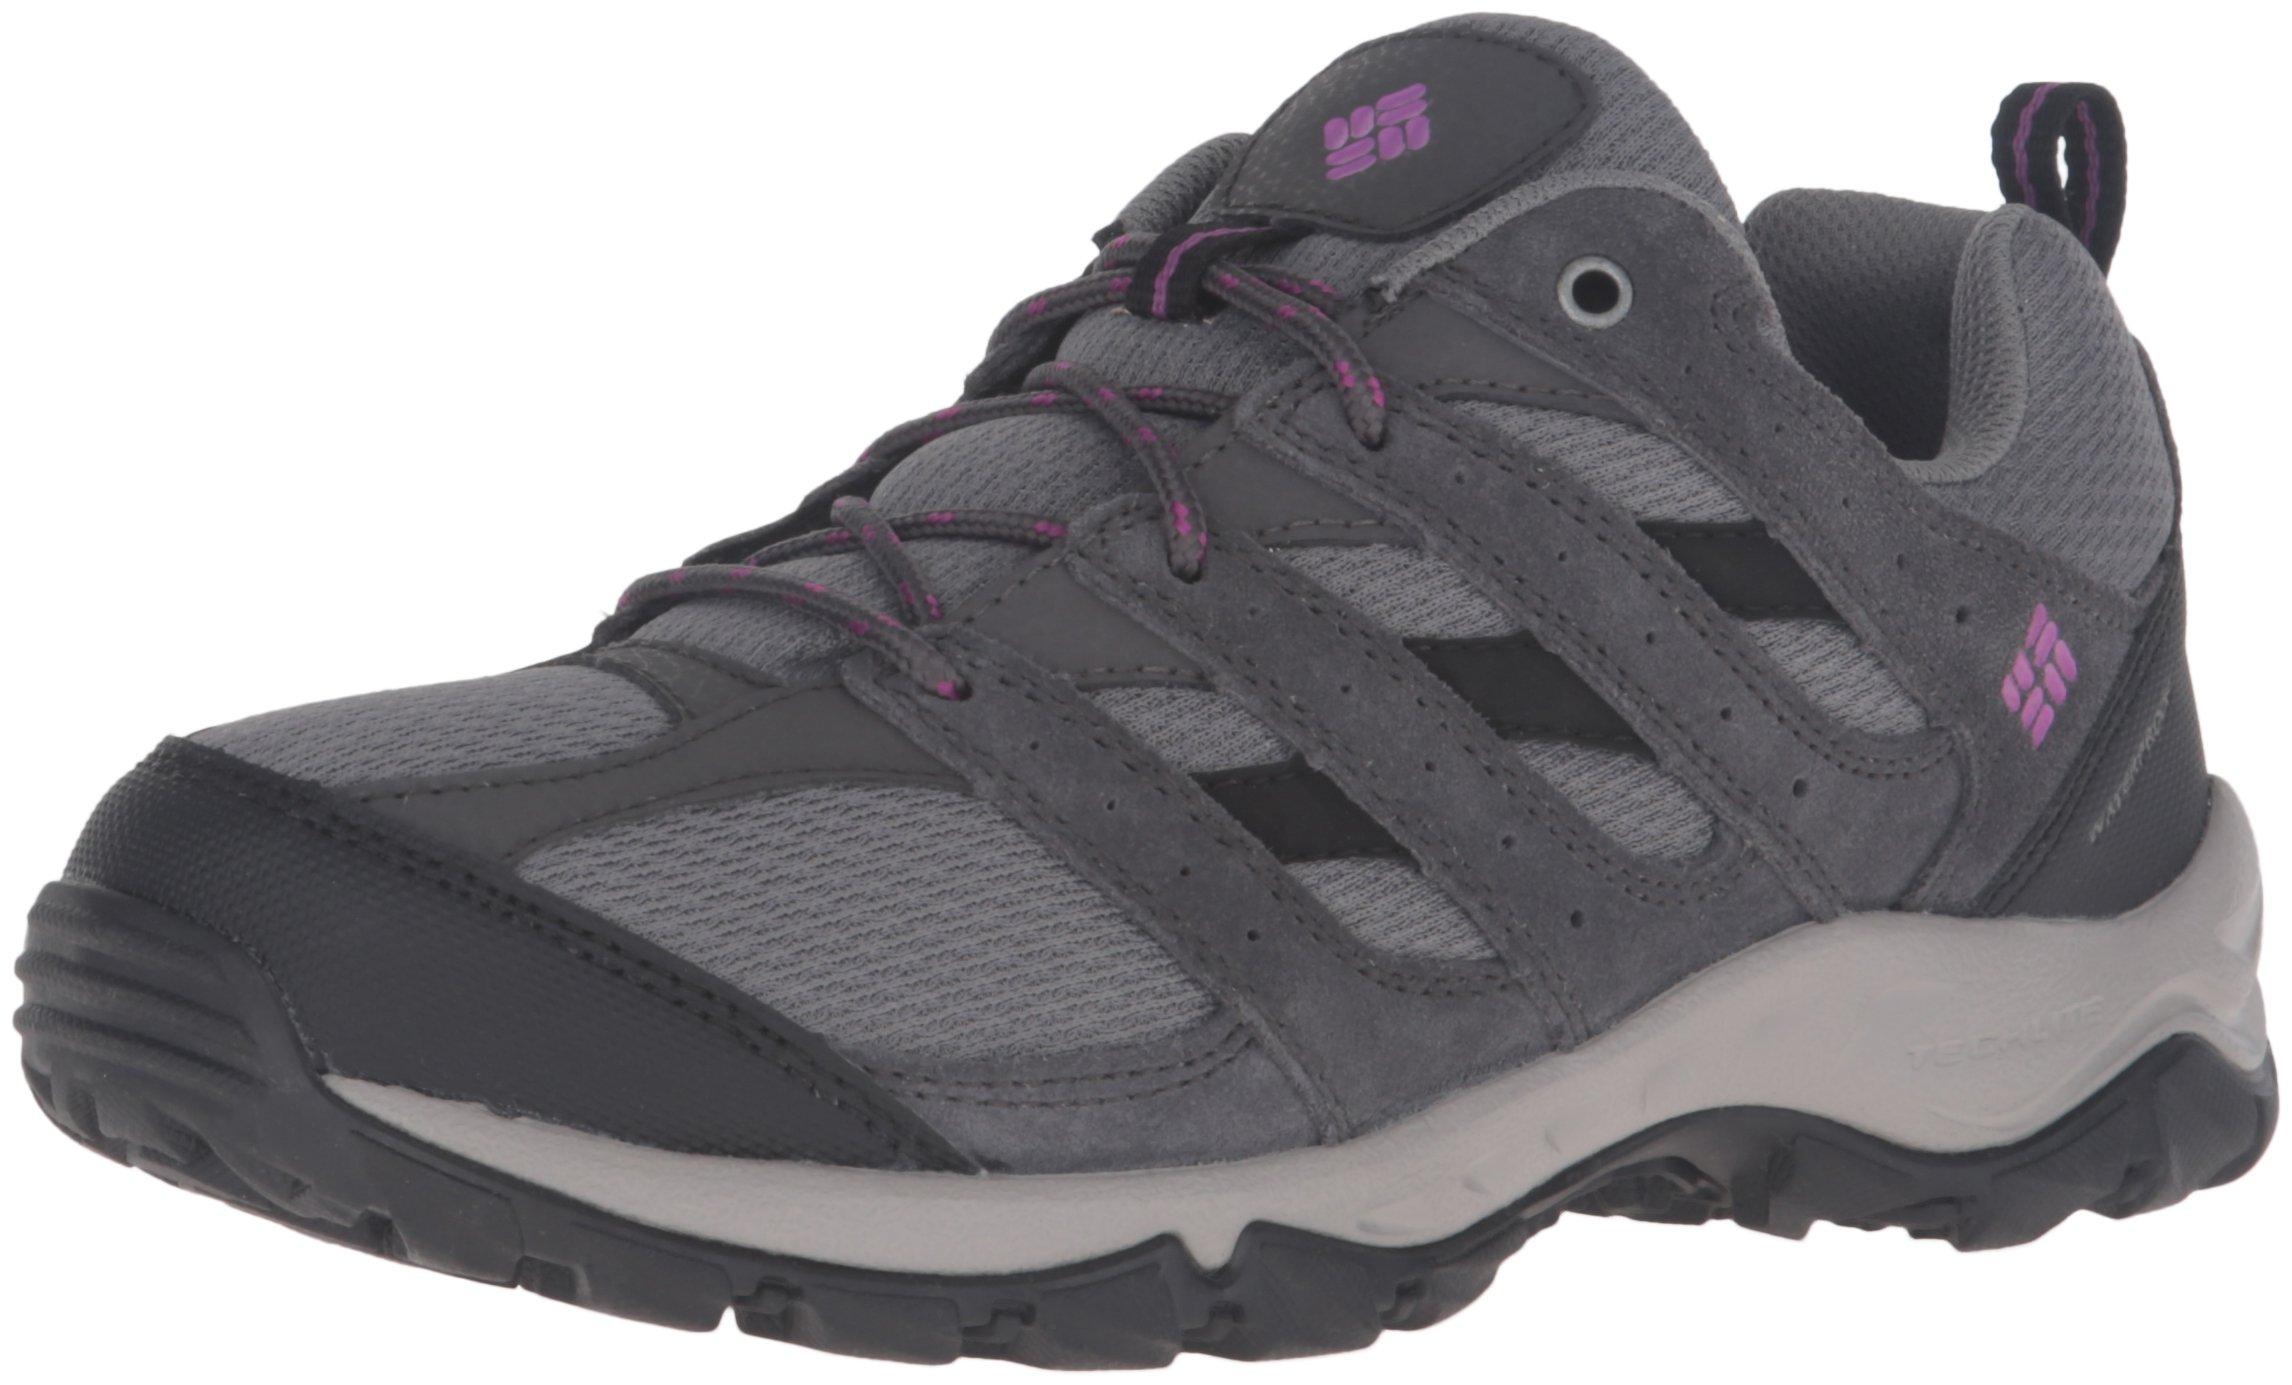 Columbia Women's Plains Butte Waterproof Hiking Shoes, Quarry/Intense Violet, 5 B US